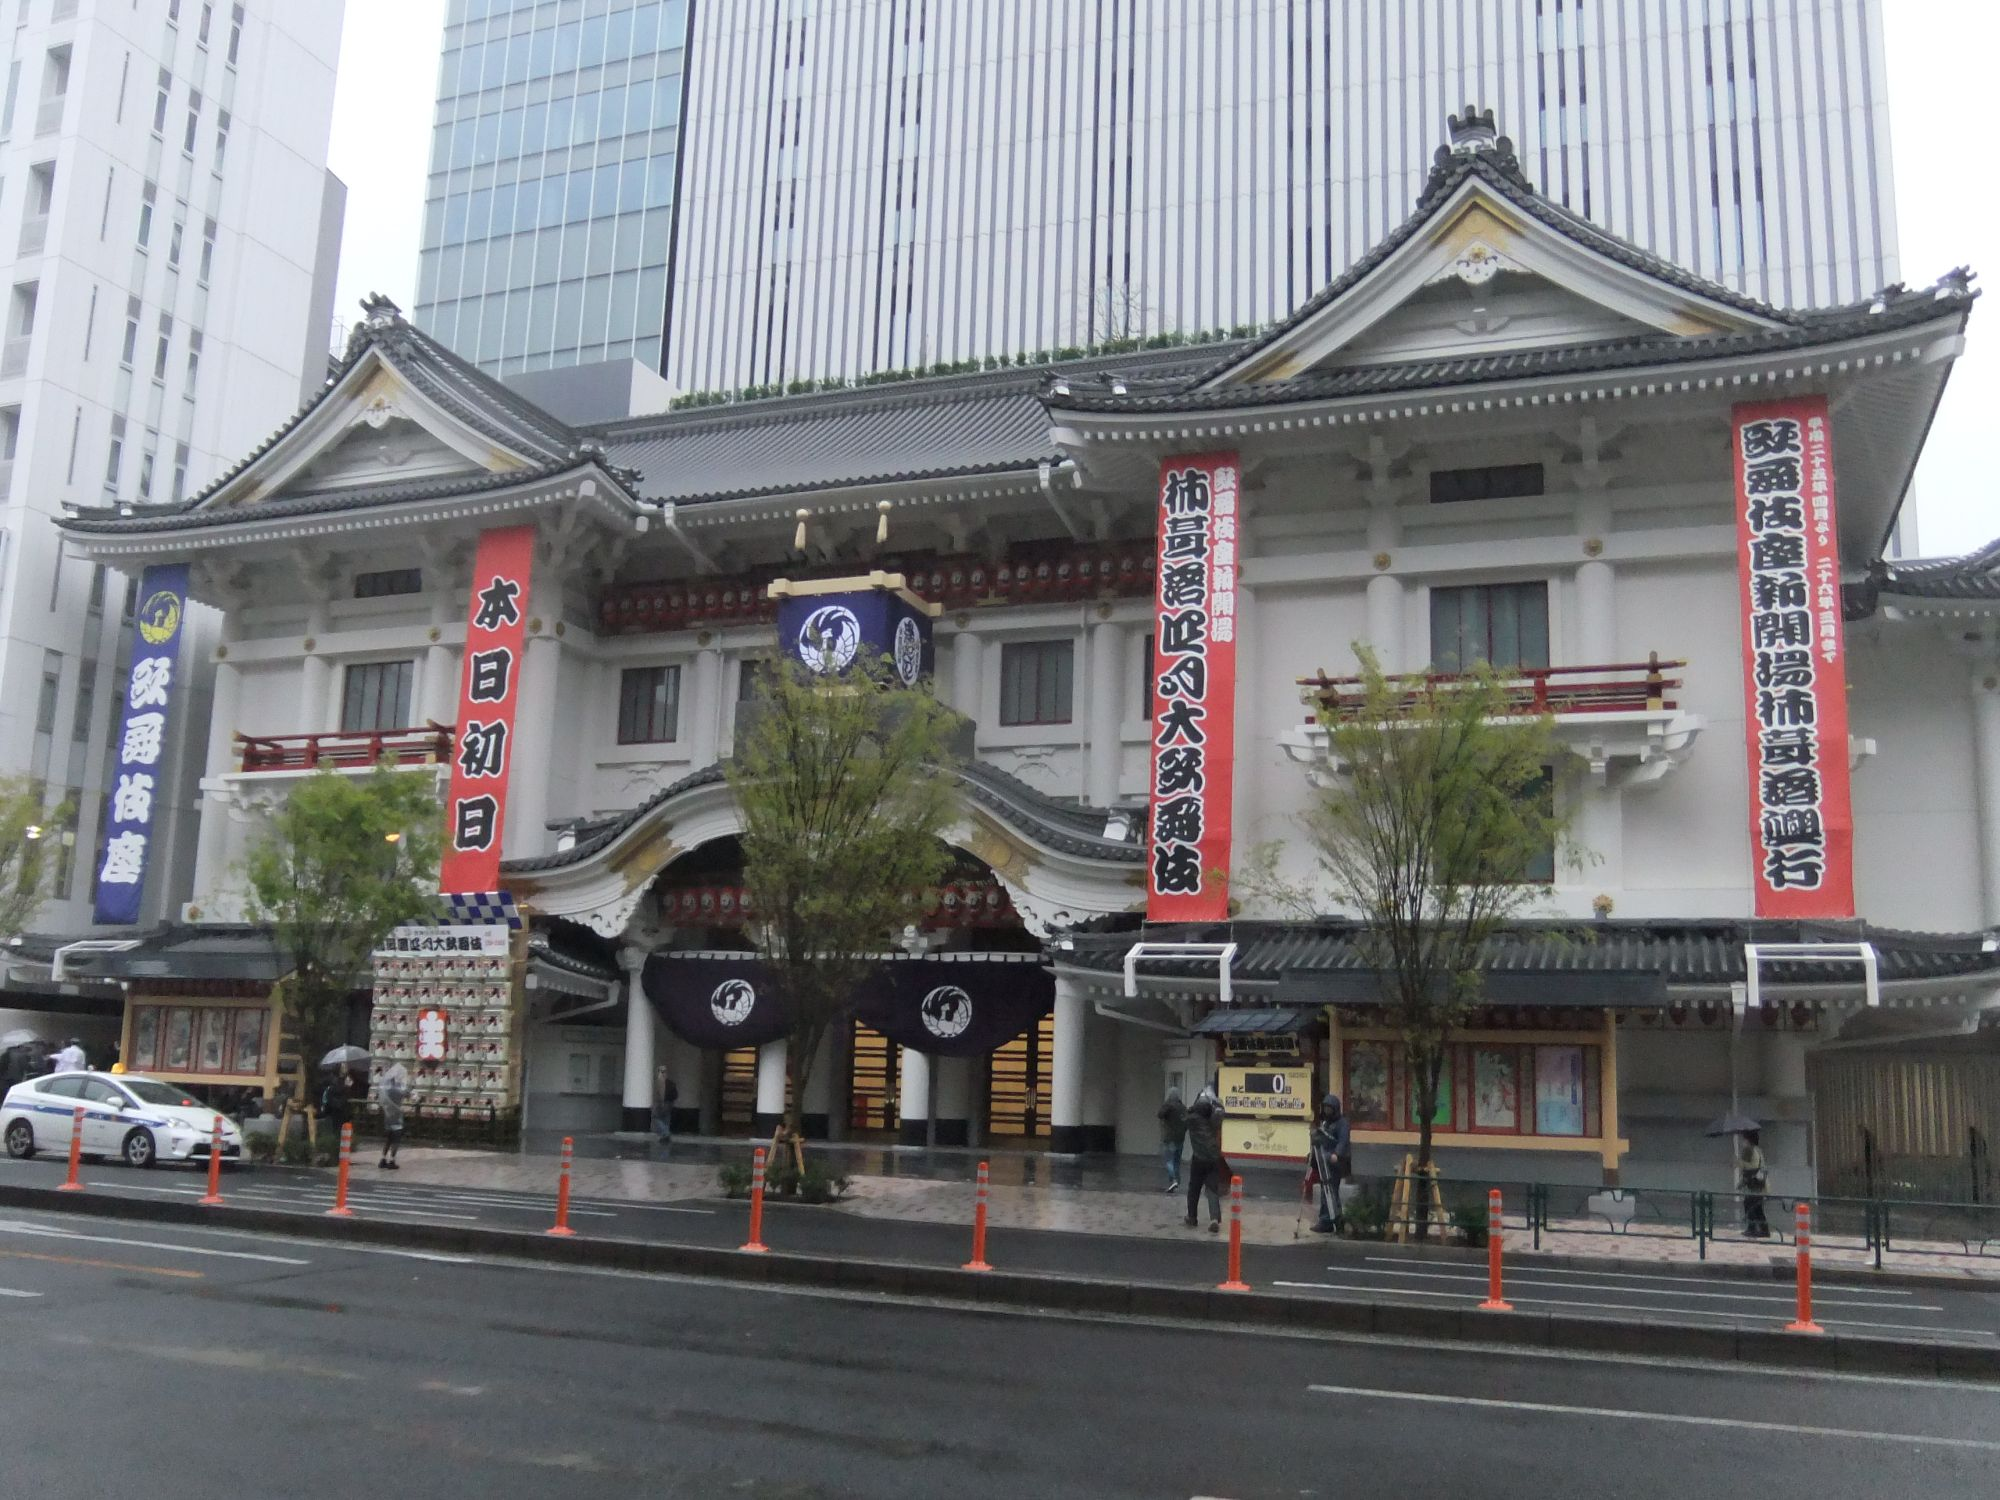 File:Kabuki-za Theatre 2013 0402.jpg - Wikimedia Commons